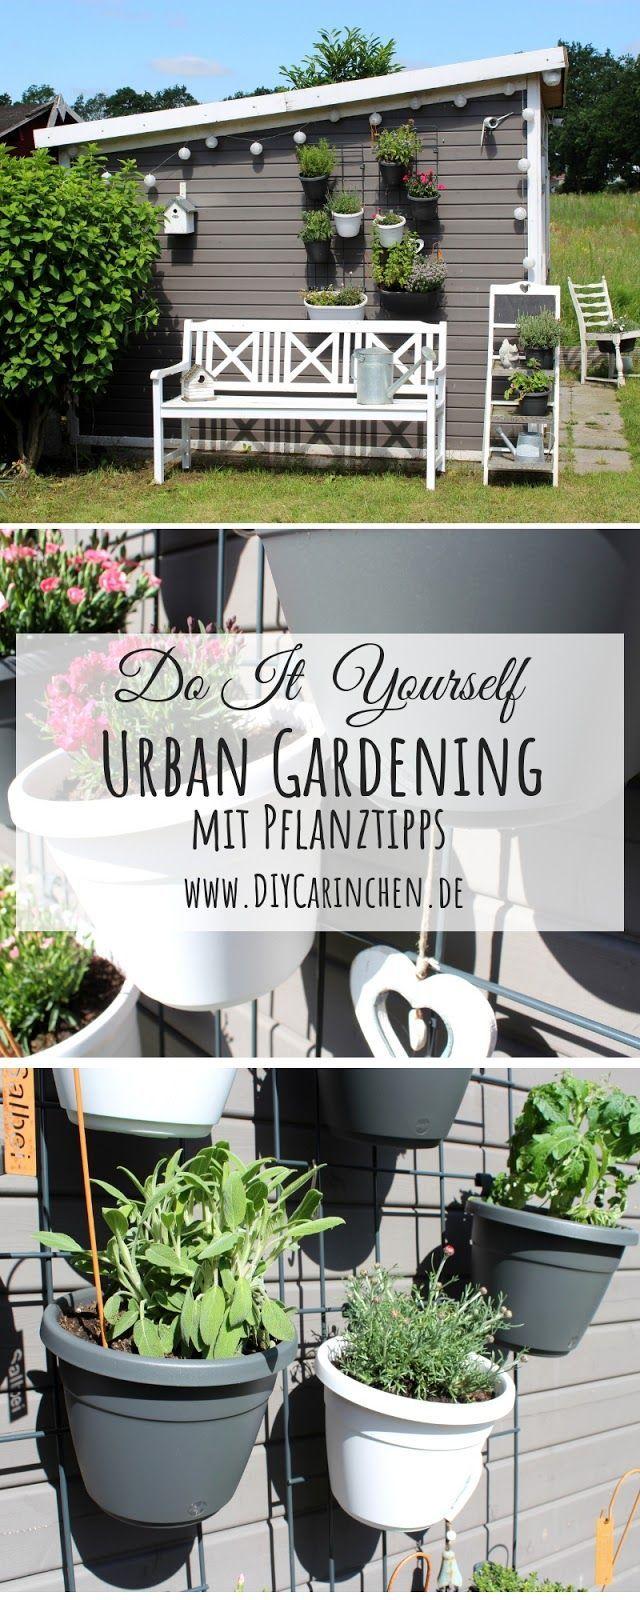 Diy Urban Gardening Mit Dem Emsa Wandgarten Tipps Und Tricks Wandgarten Gardening Urban Garden Design